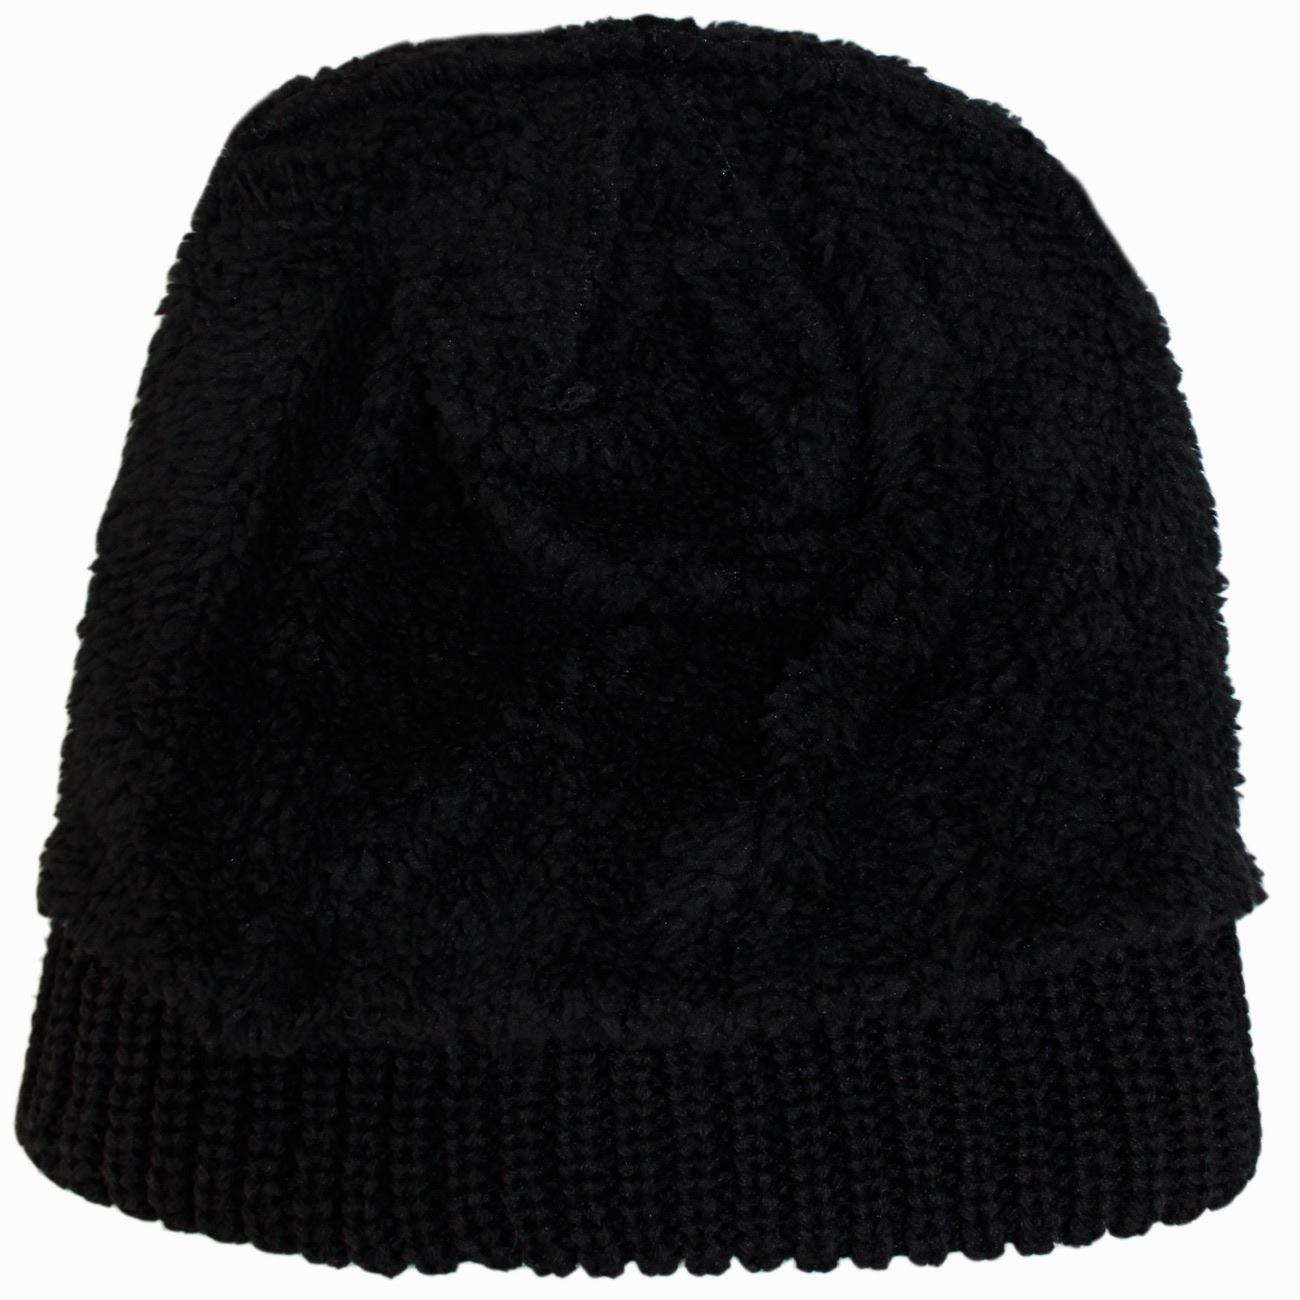 Mens Heavy 4.7 Tog Cap Thermal Brush Fleece Lined Ultimate Heat Winter Hat